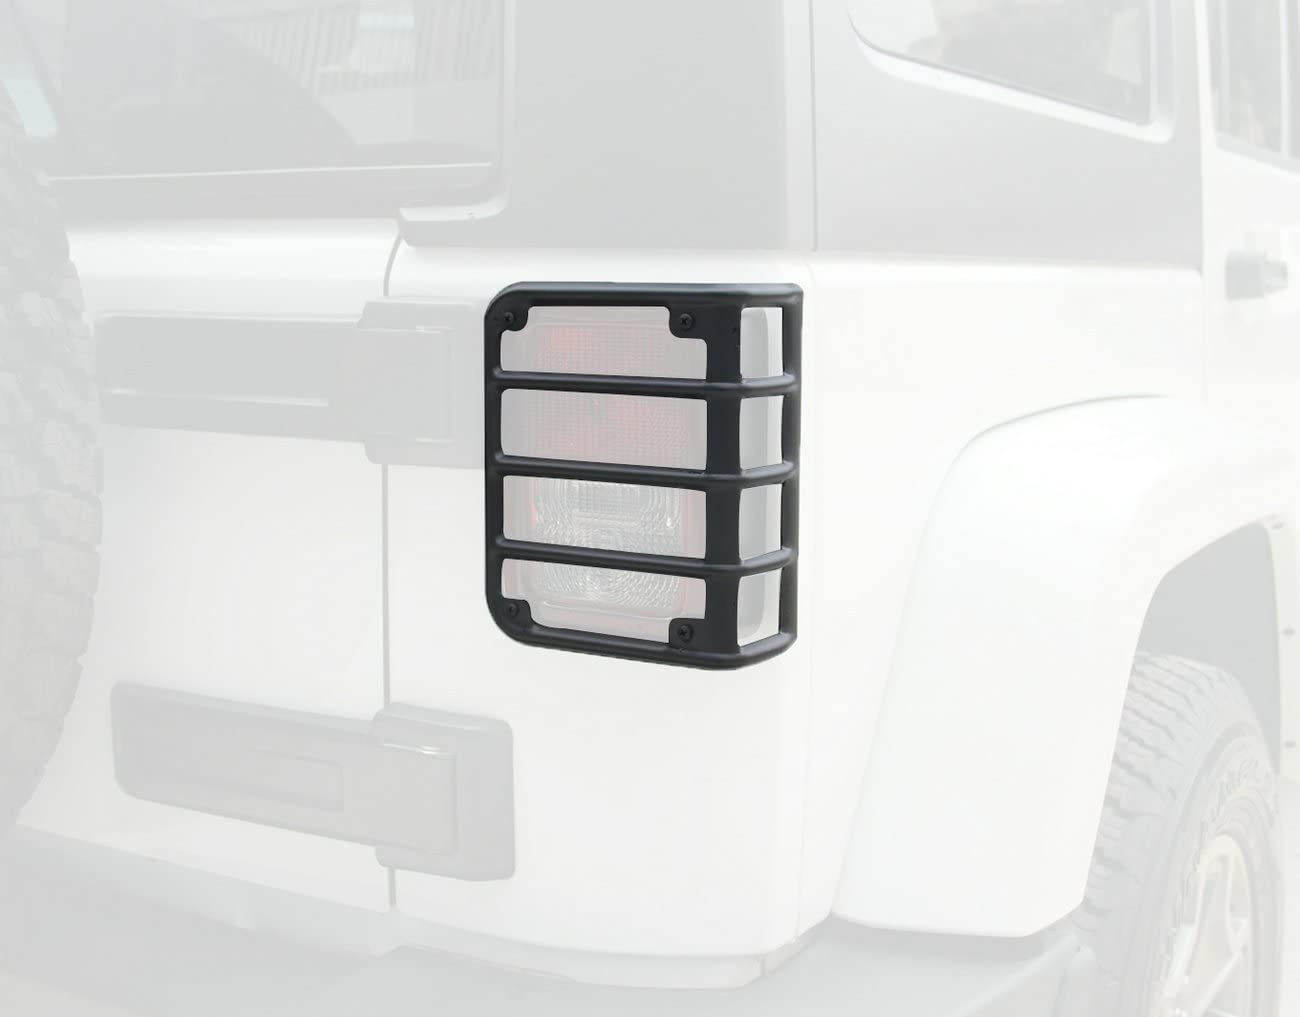 Pair Jeep Wrangler stainless steel Black Euro Tail Light Guard Cover Protector for 2007-2018 Jeep Wrangler 2018 Sahara JKU Brake Light Protector New